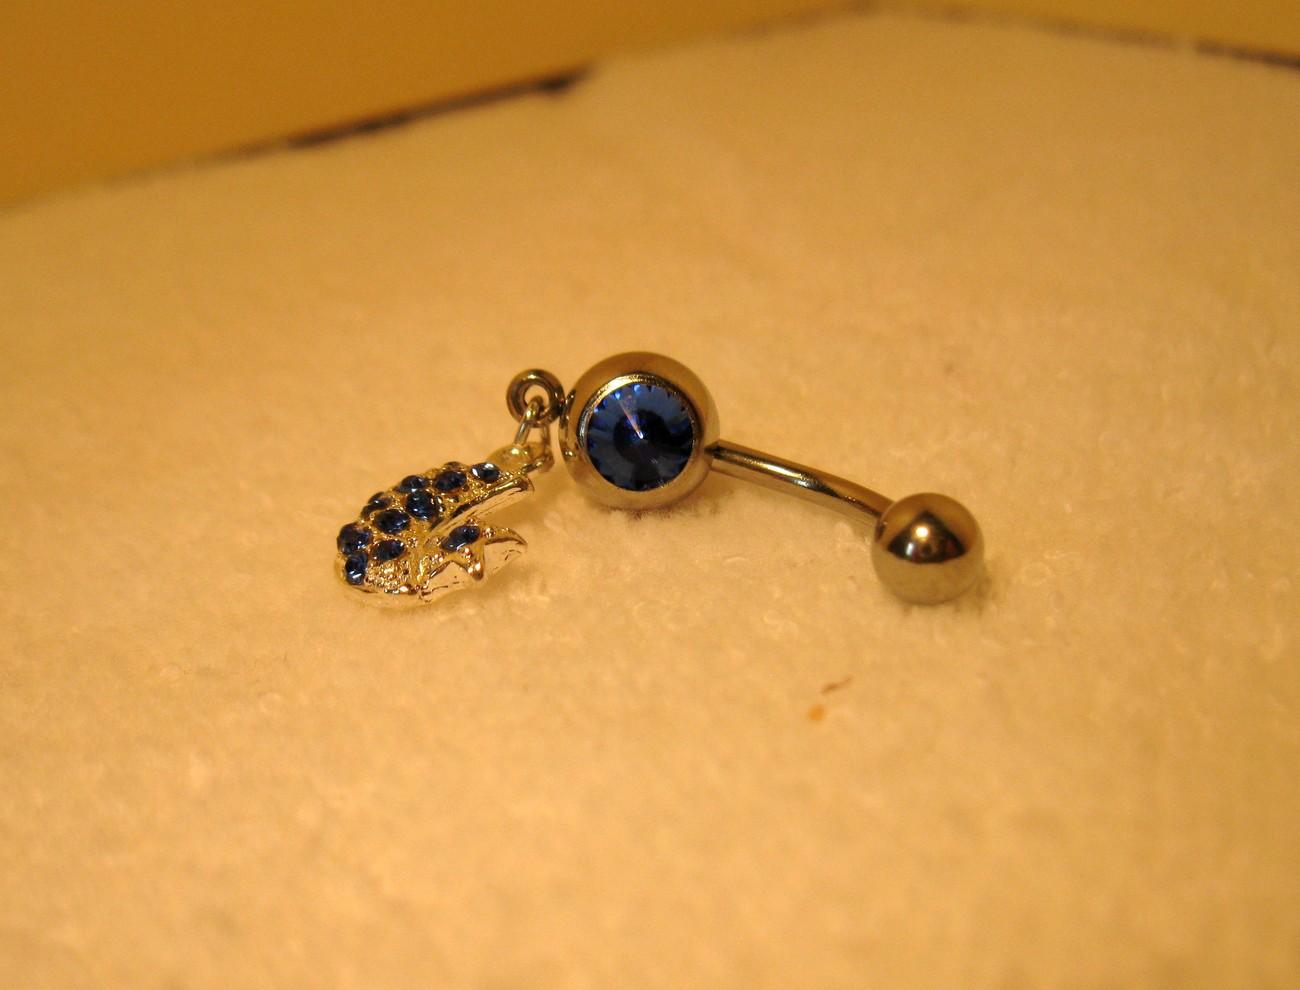 686a blue sapphire moon belly